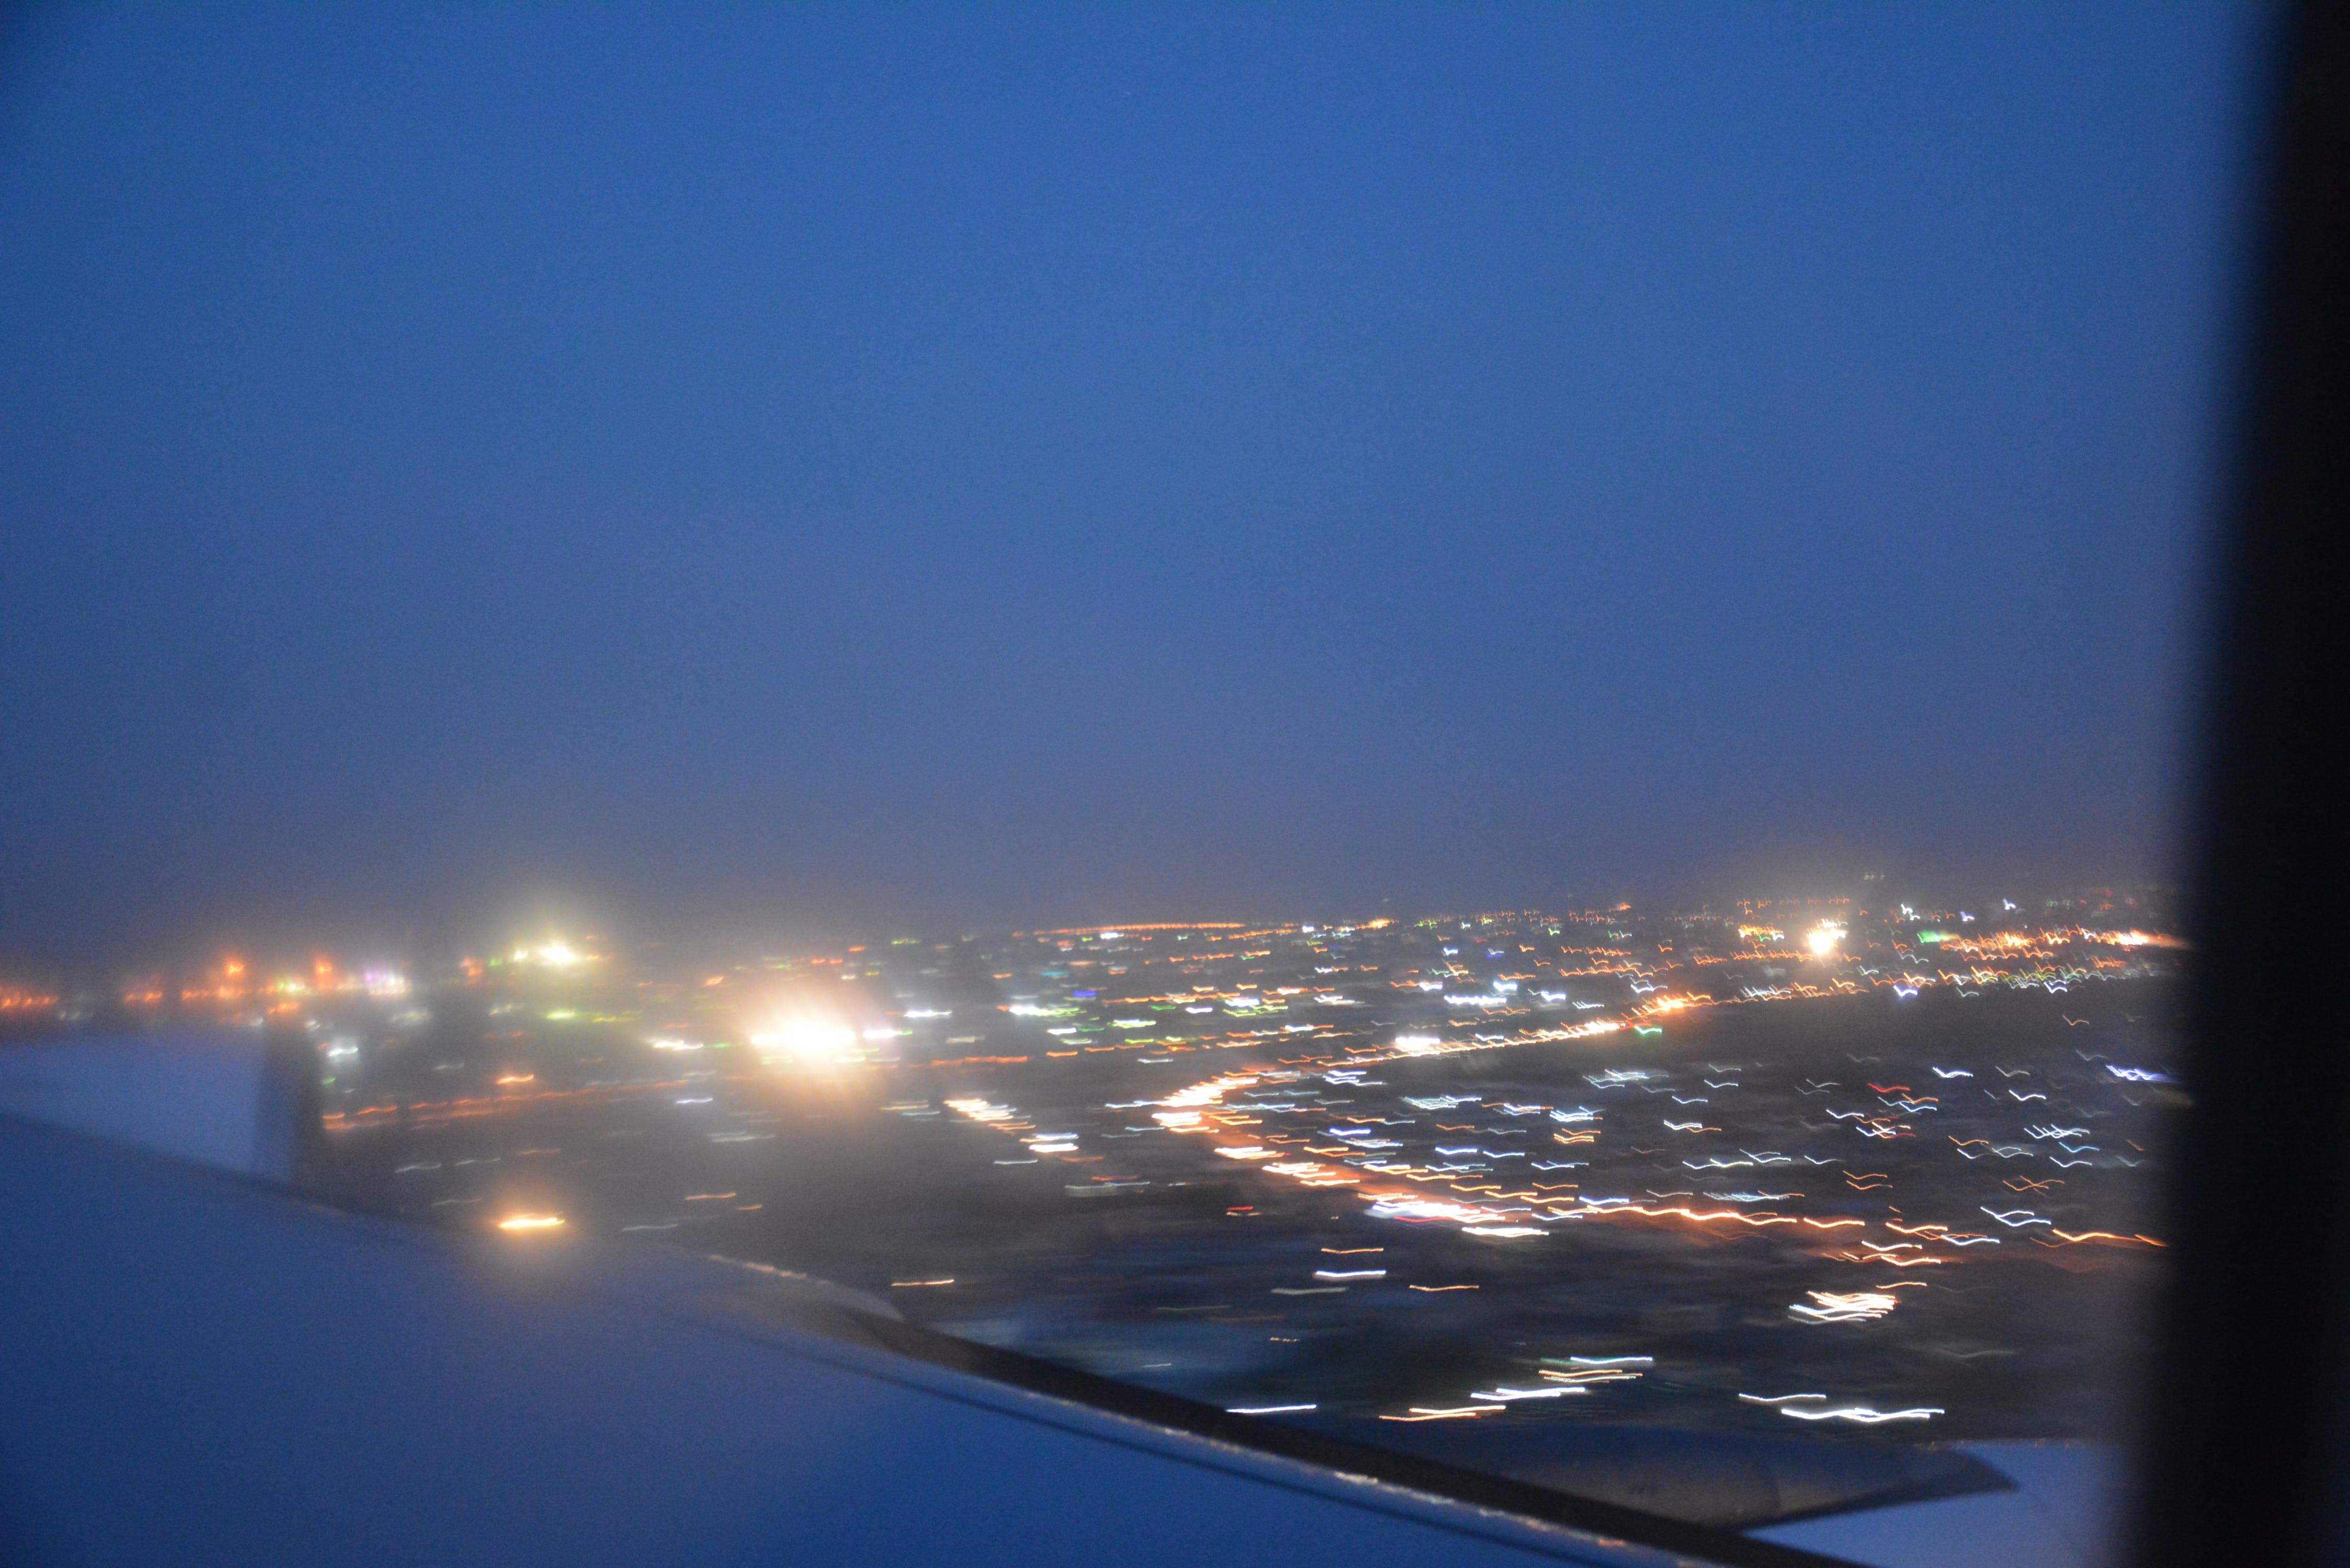 Free stock photo of airplane view, blue skies, city lights, night lights